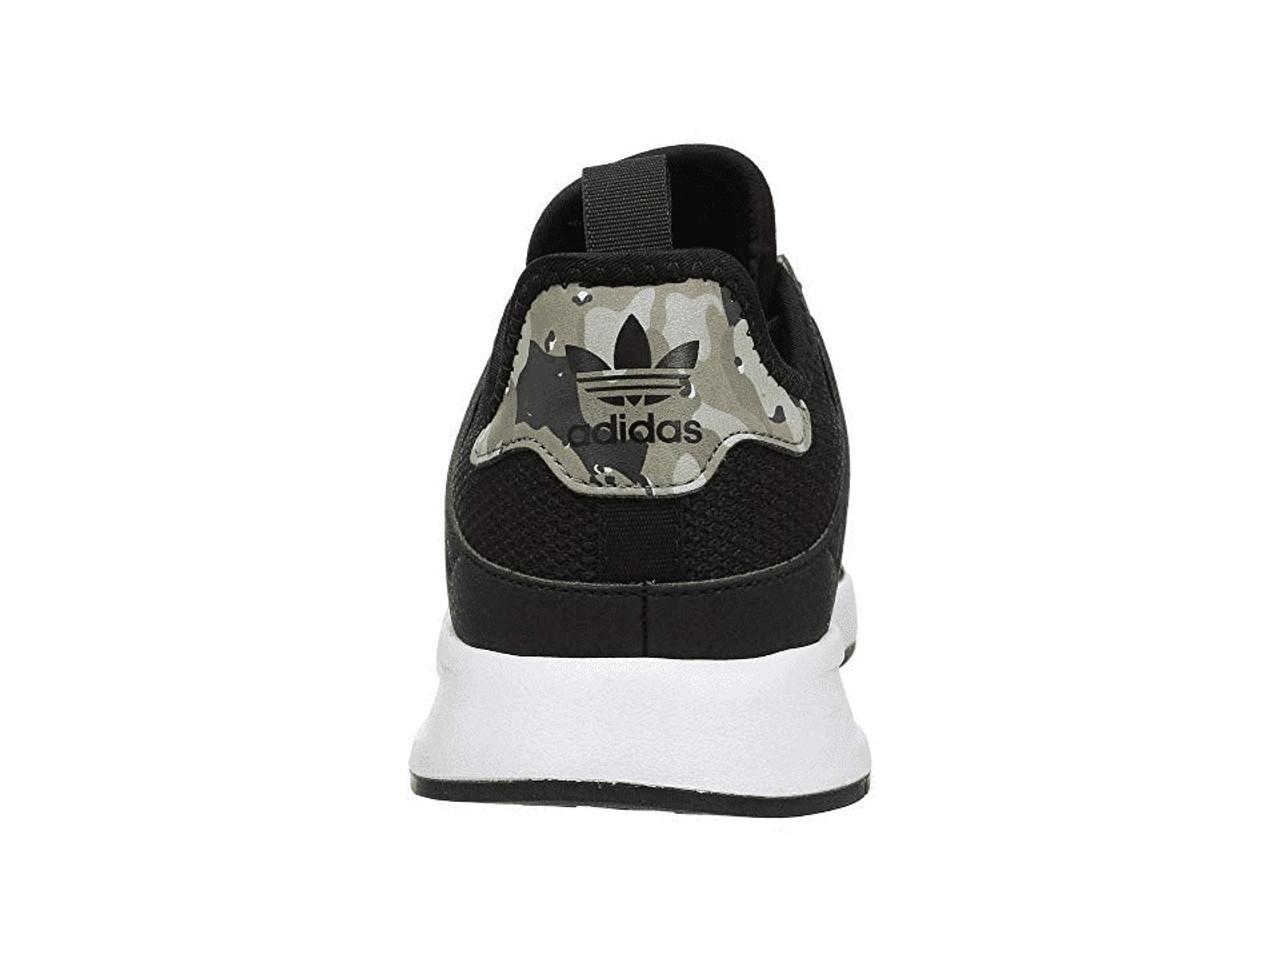 92fa73bae0 Adidas X Plr Shoes Black White Camo